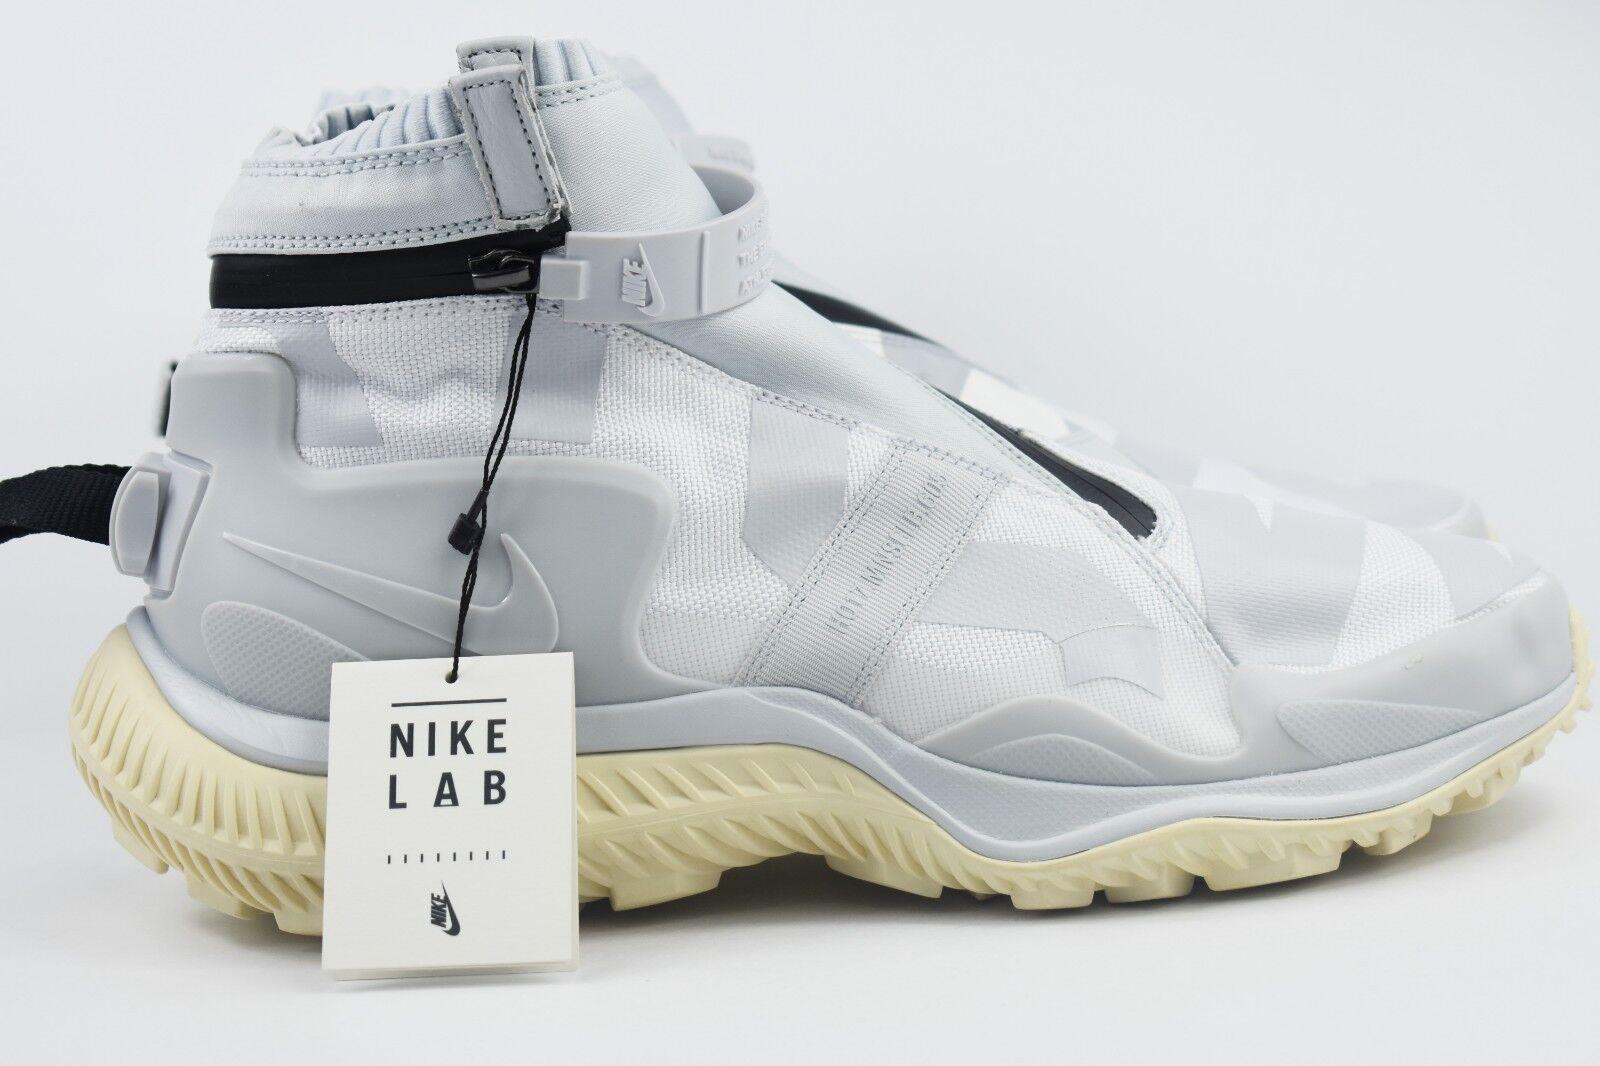 Nike nikelab gyakusou mens größe 11,5 gamasche probiert boot boot boot aus platin aa0530 100 488608